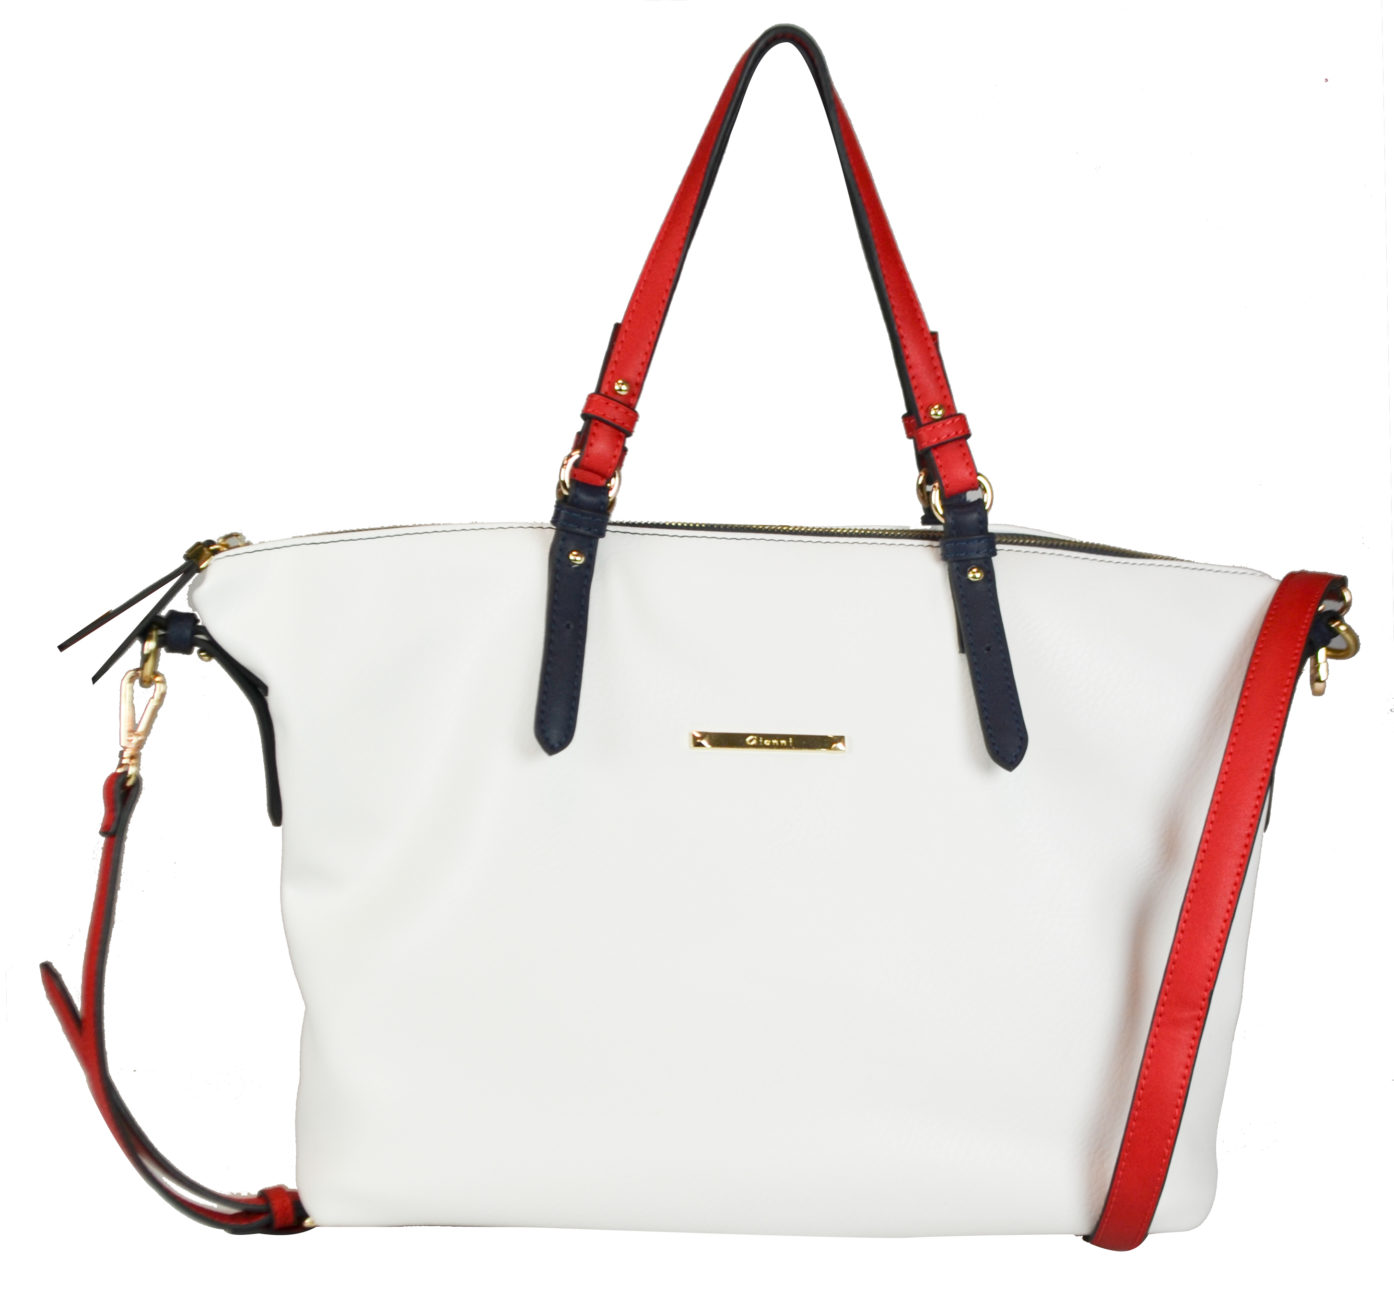 Bag_White_Red Strap